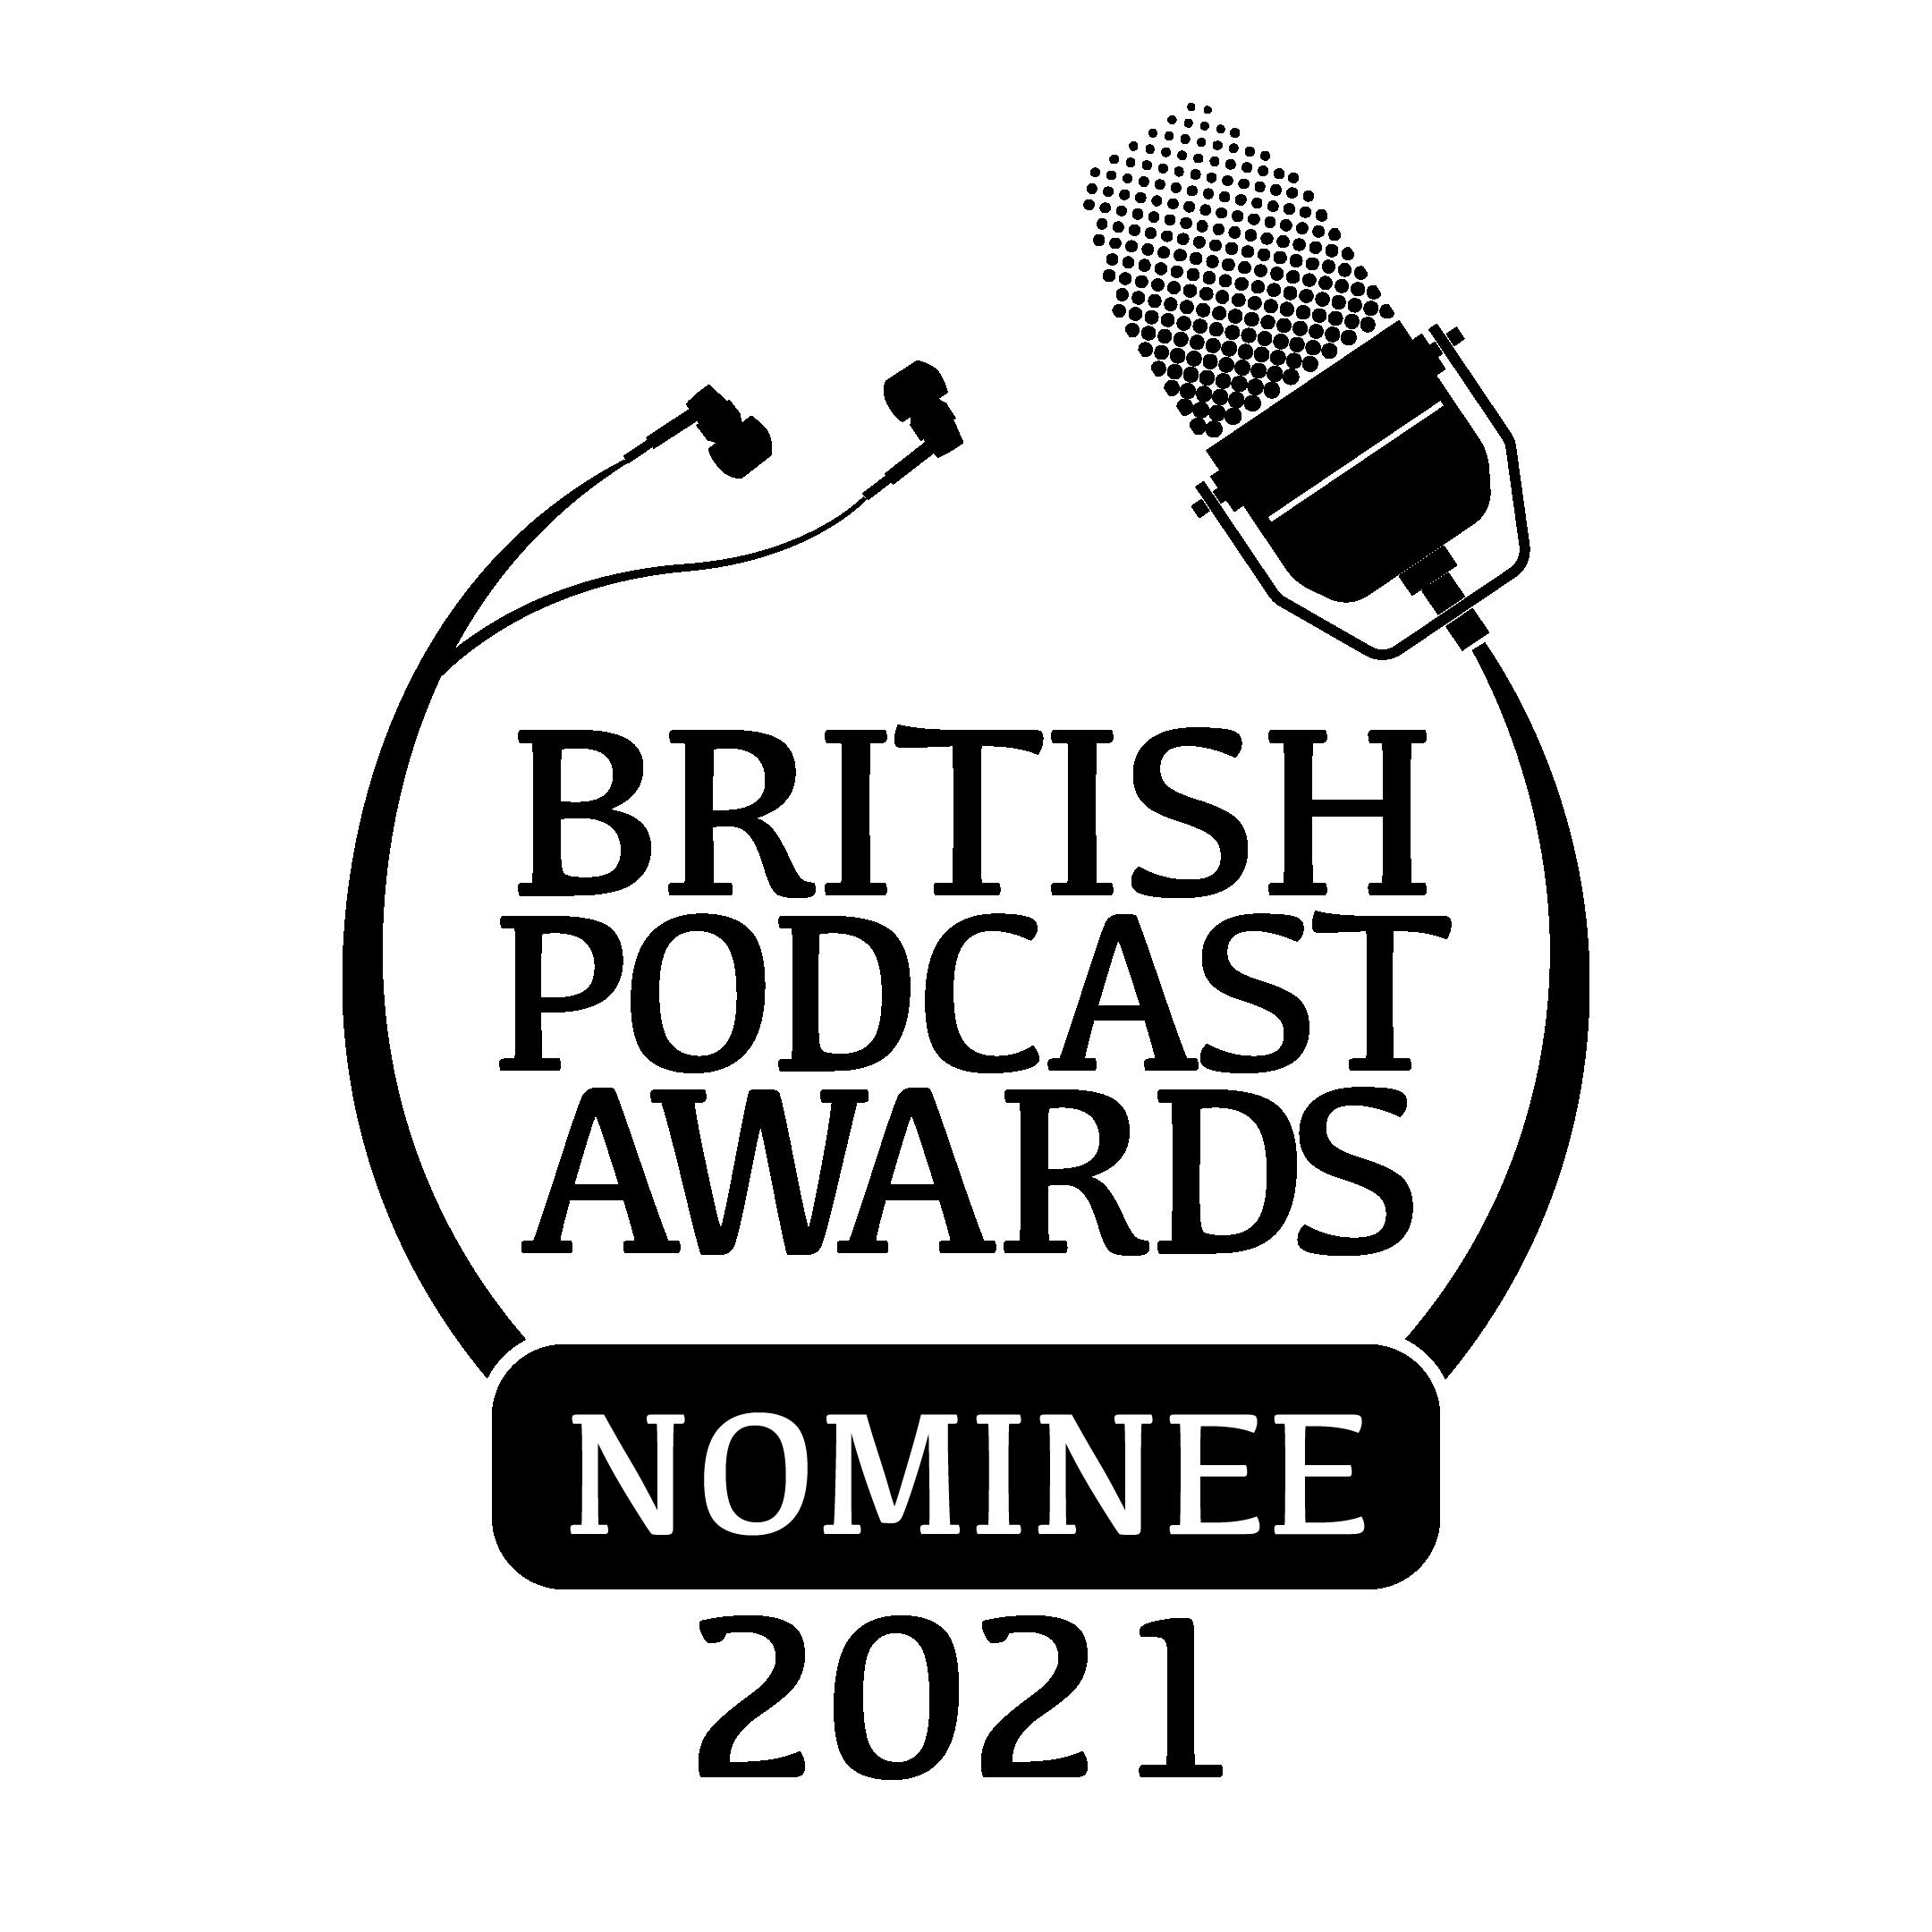 British Podcast Awards nominee 2021